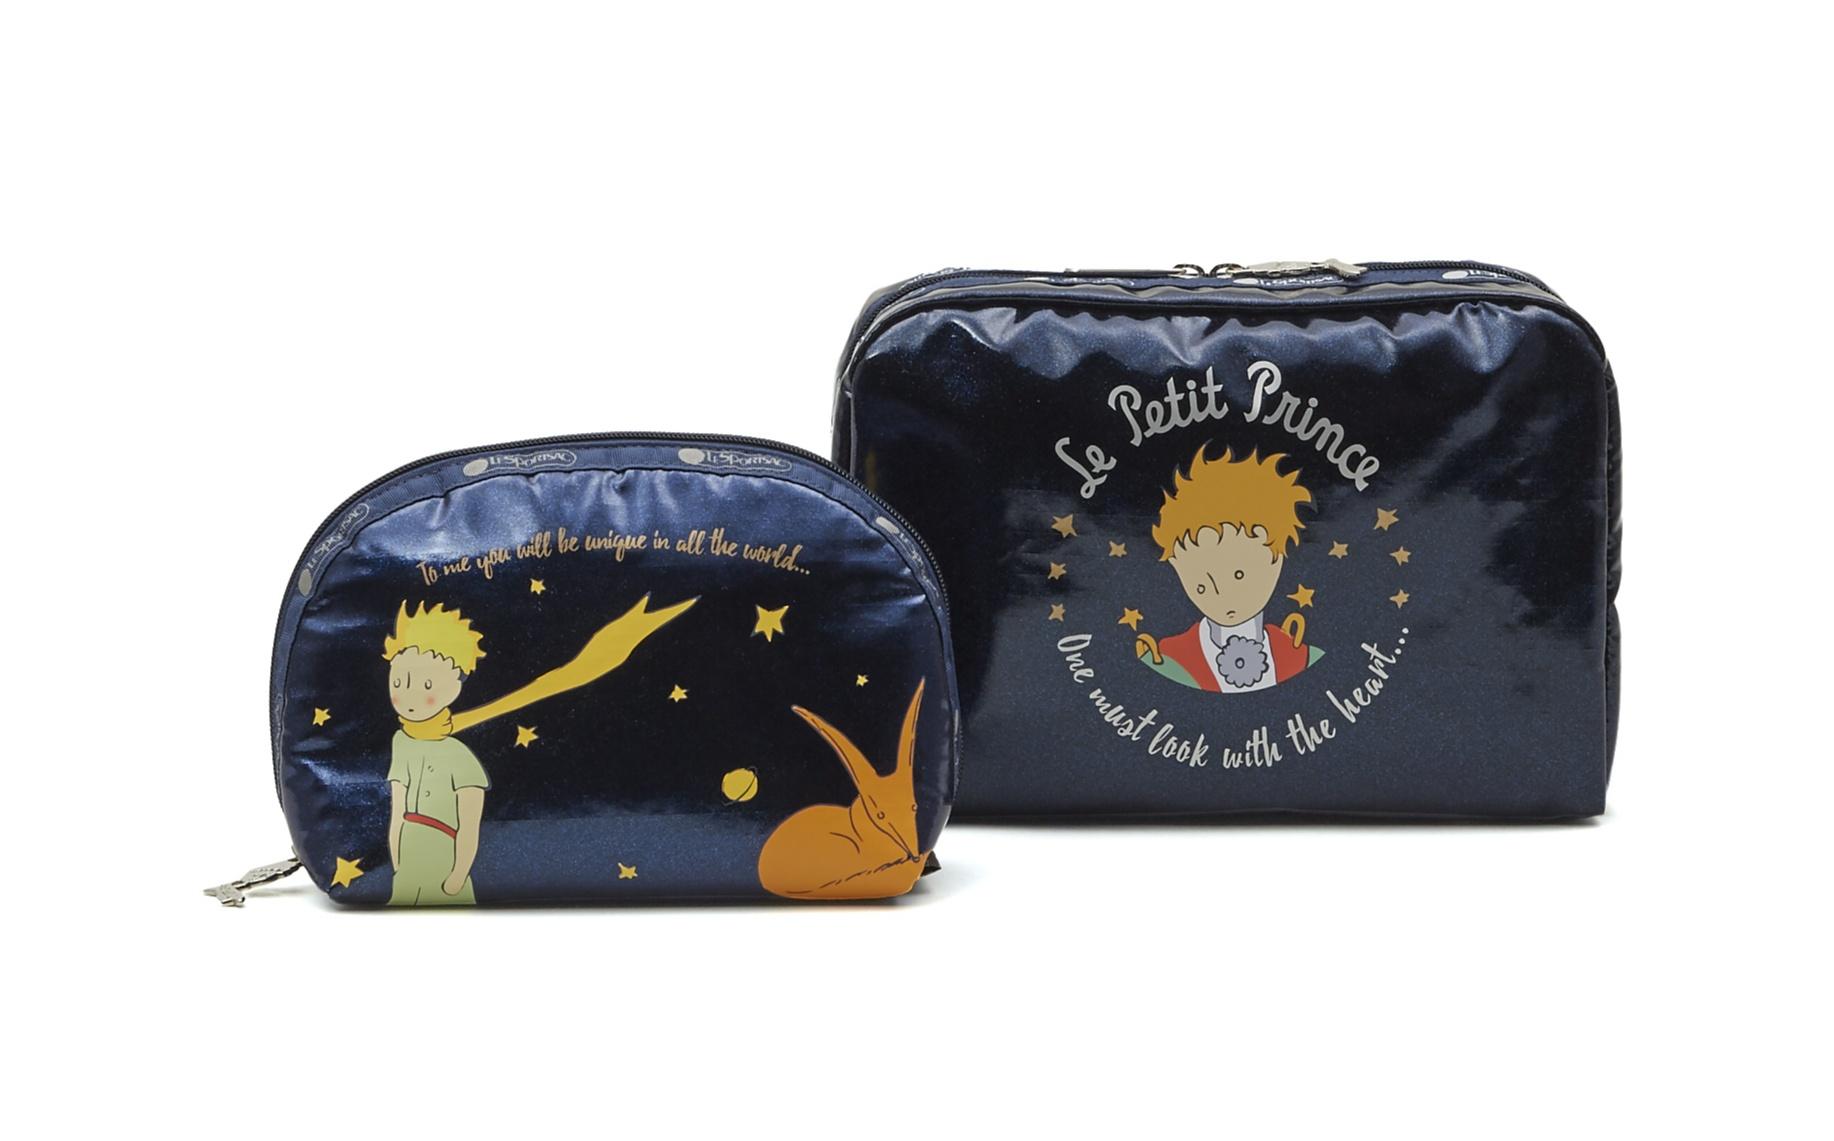 「Le Petit Prince 星の王子さま」とコラボ☆ 3/7(水)発売の『レスポートサック』新作をチェック!_1_3